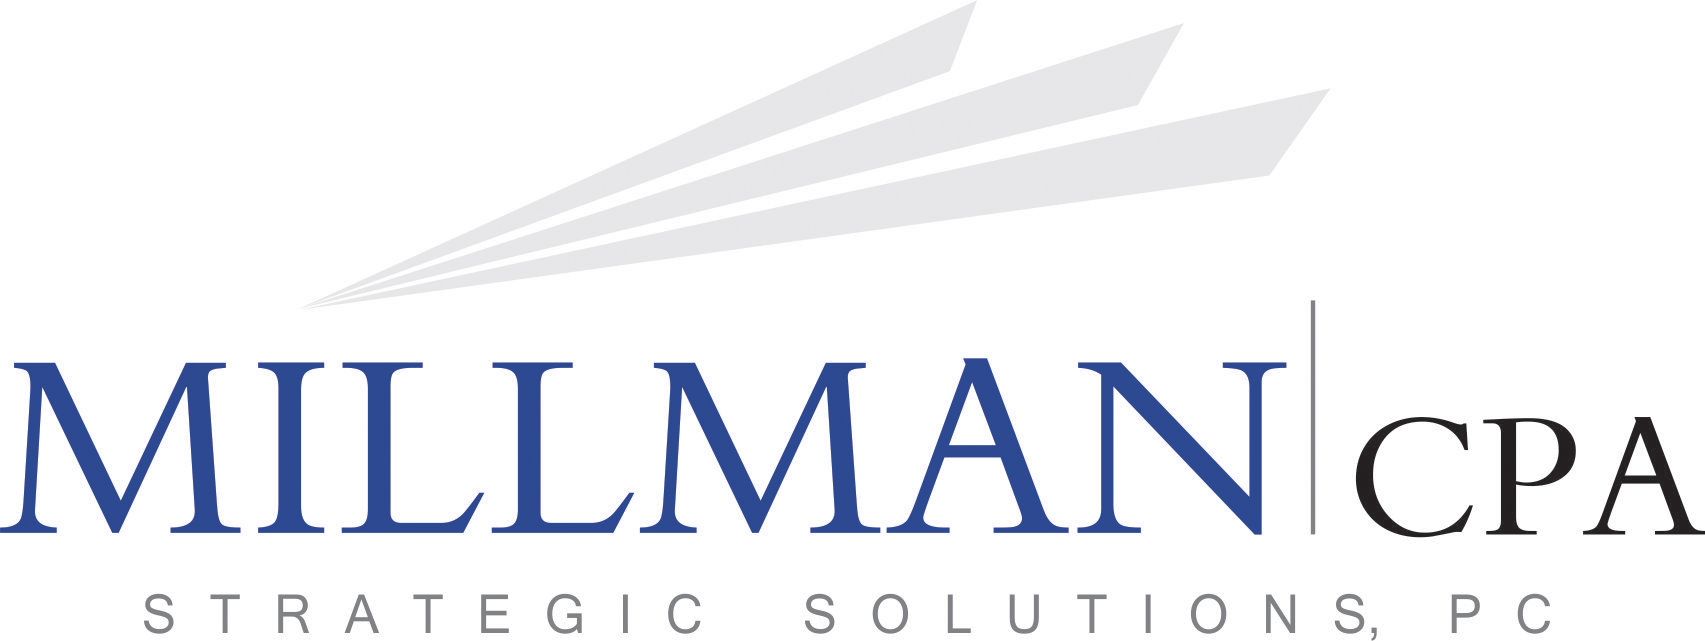 Millman CPA Strategic Solutions, PC